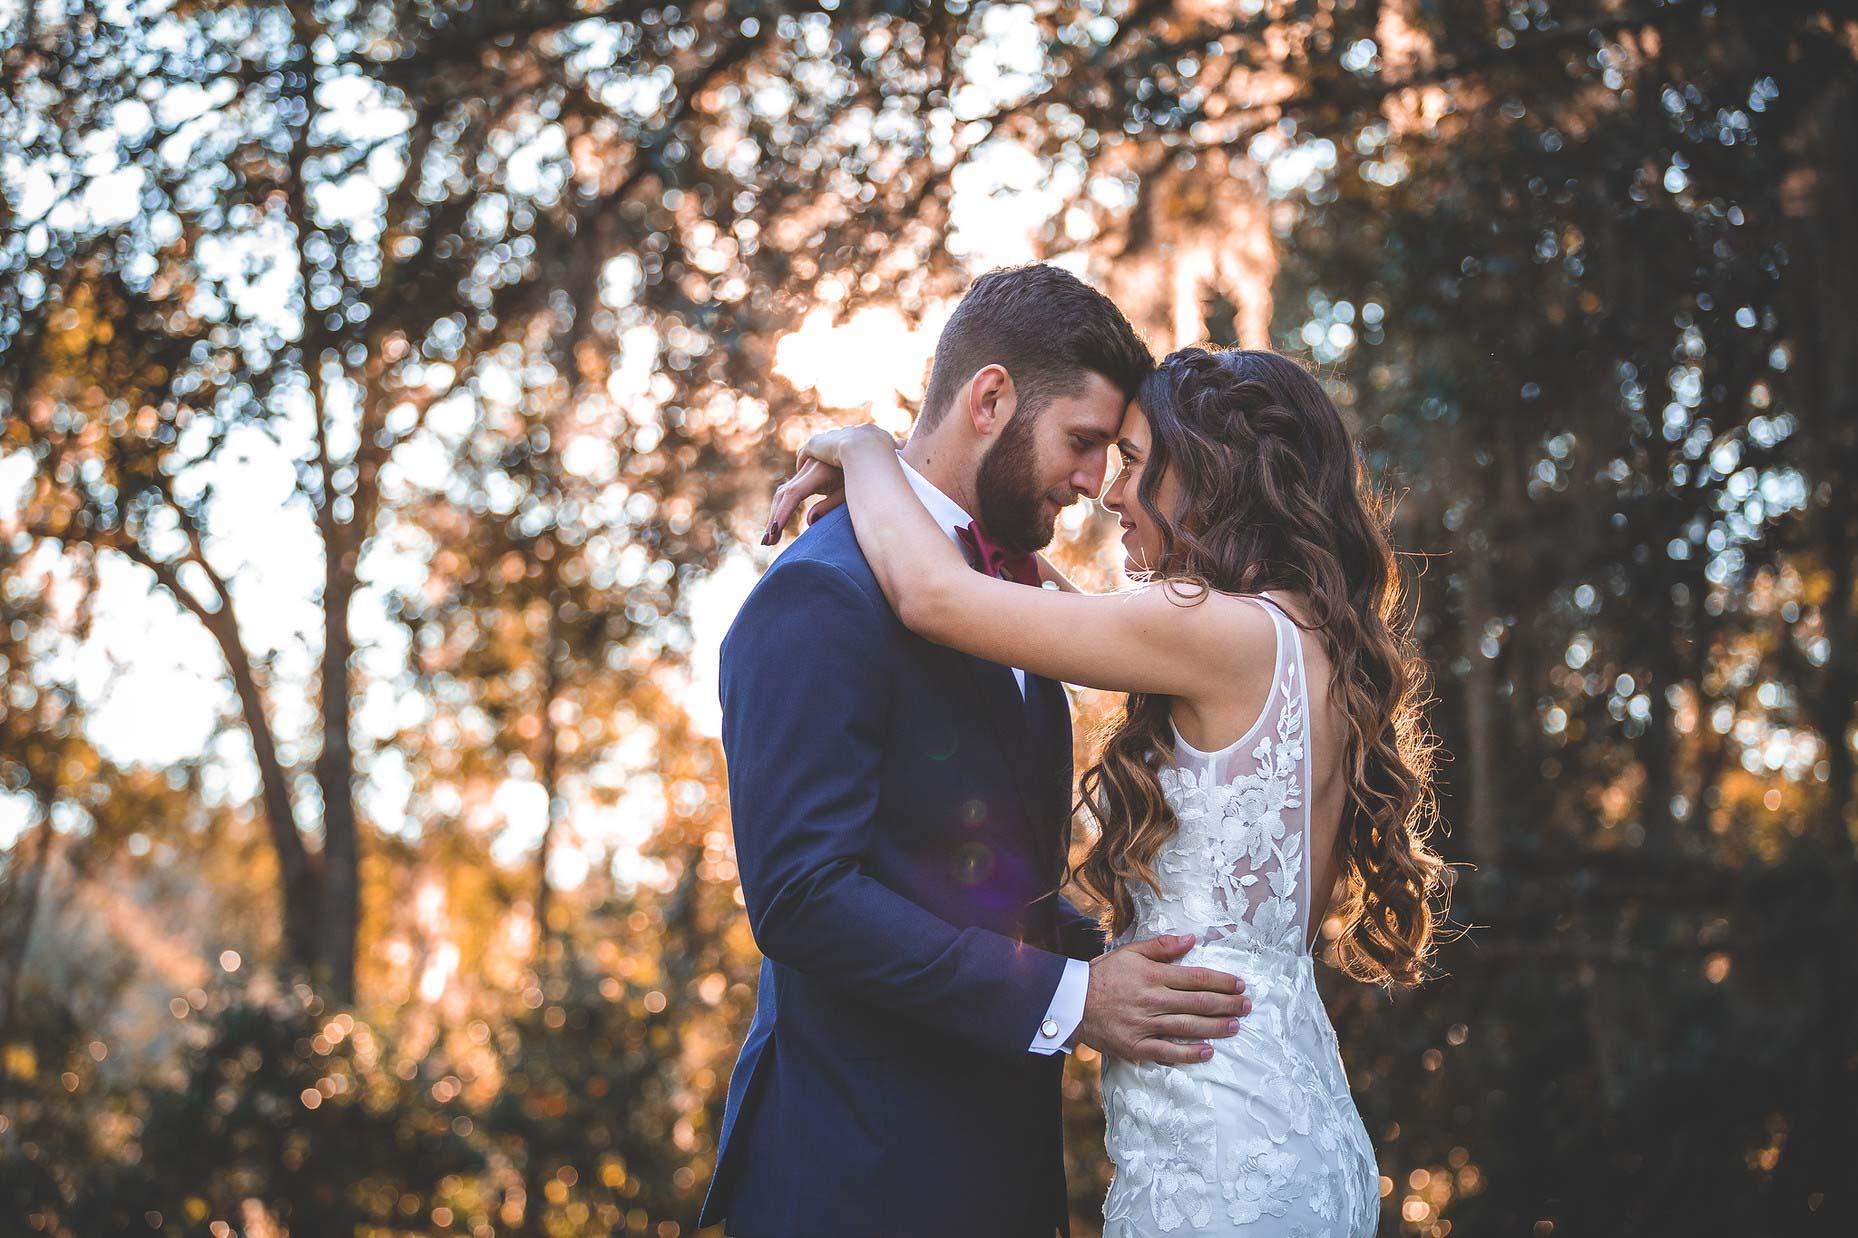 adam-szarmack-bowing-oaks-wedding-photographer-jacksonville-98.jpg